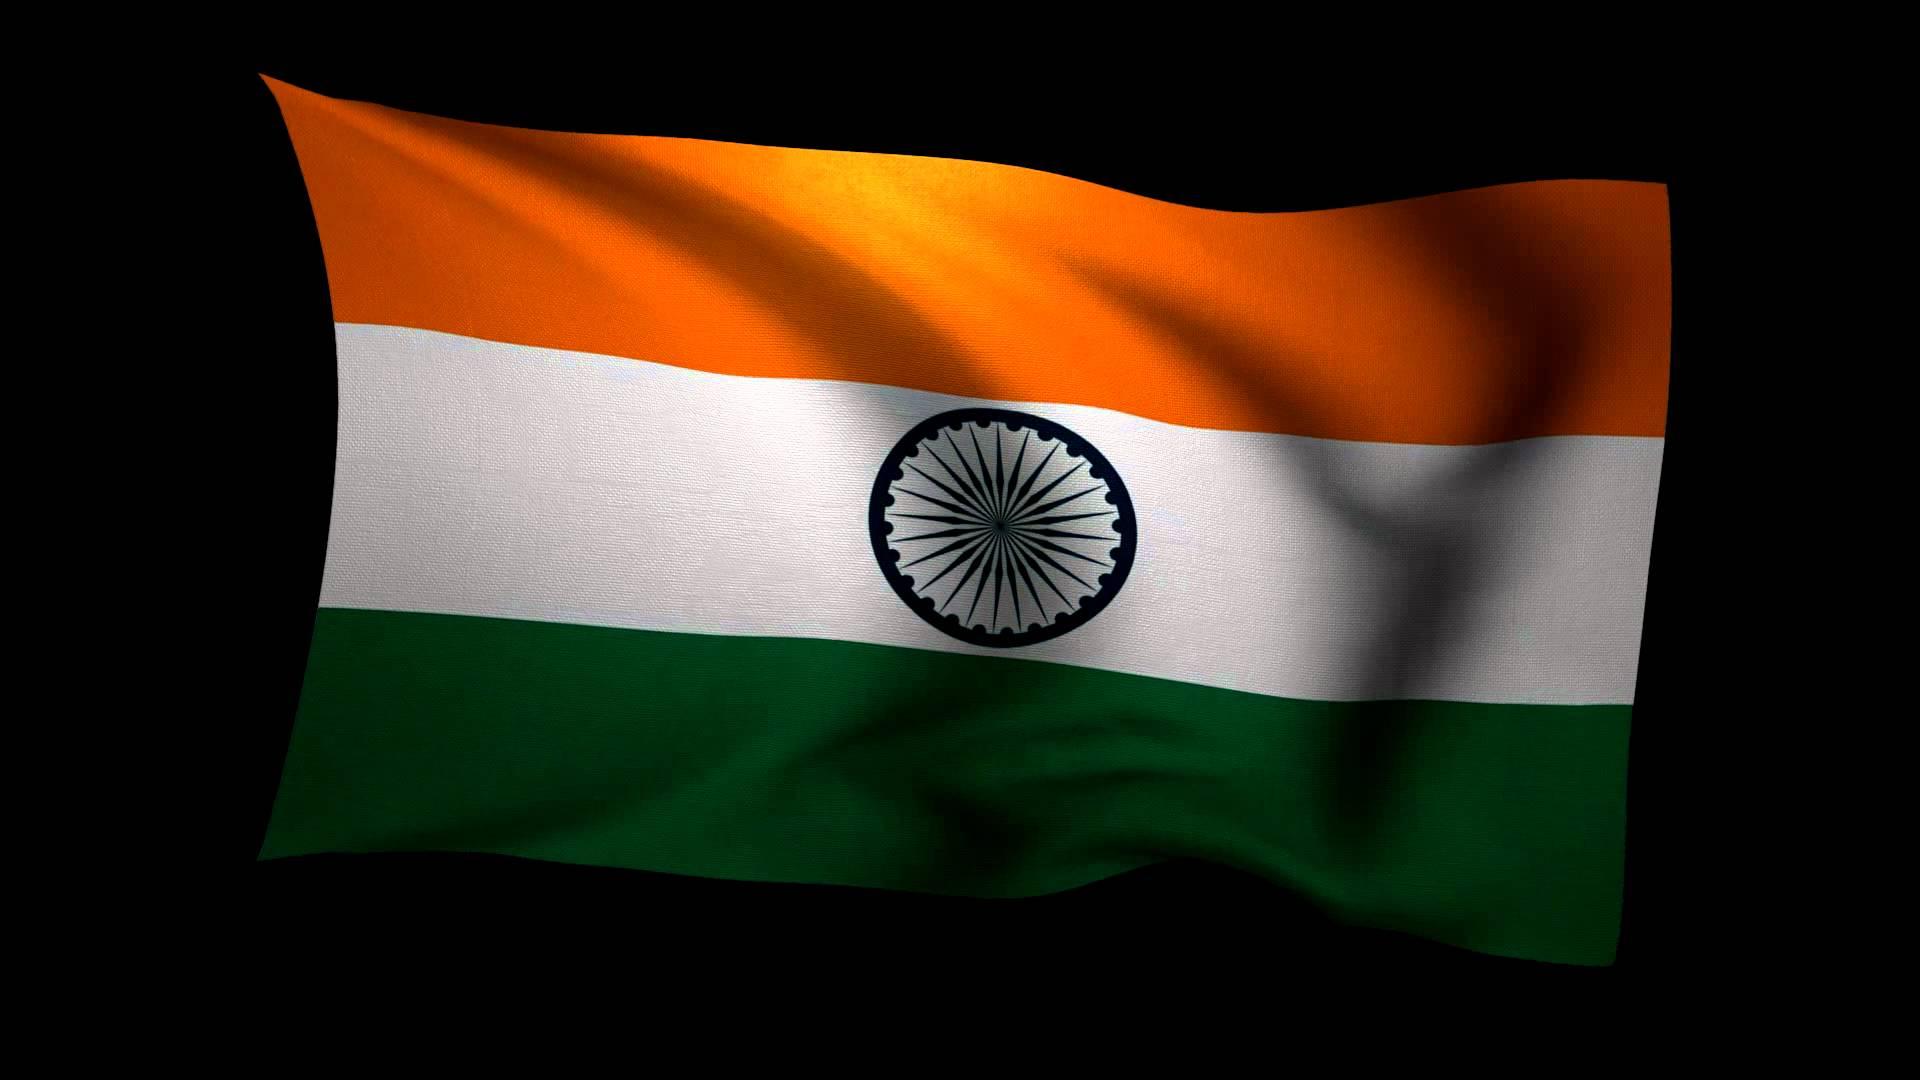 Indian National Flag Wallpaper 3D - WallpaperSafari Indian Flag Animated Wallpaper 3d